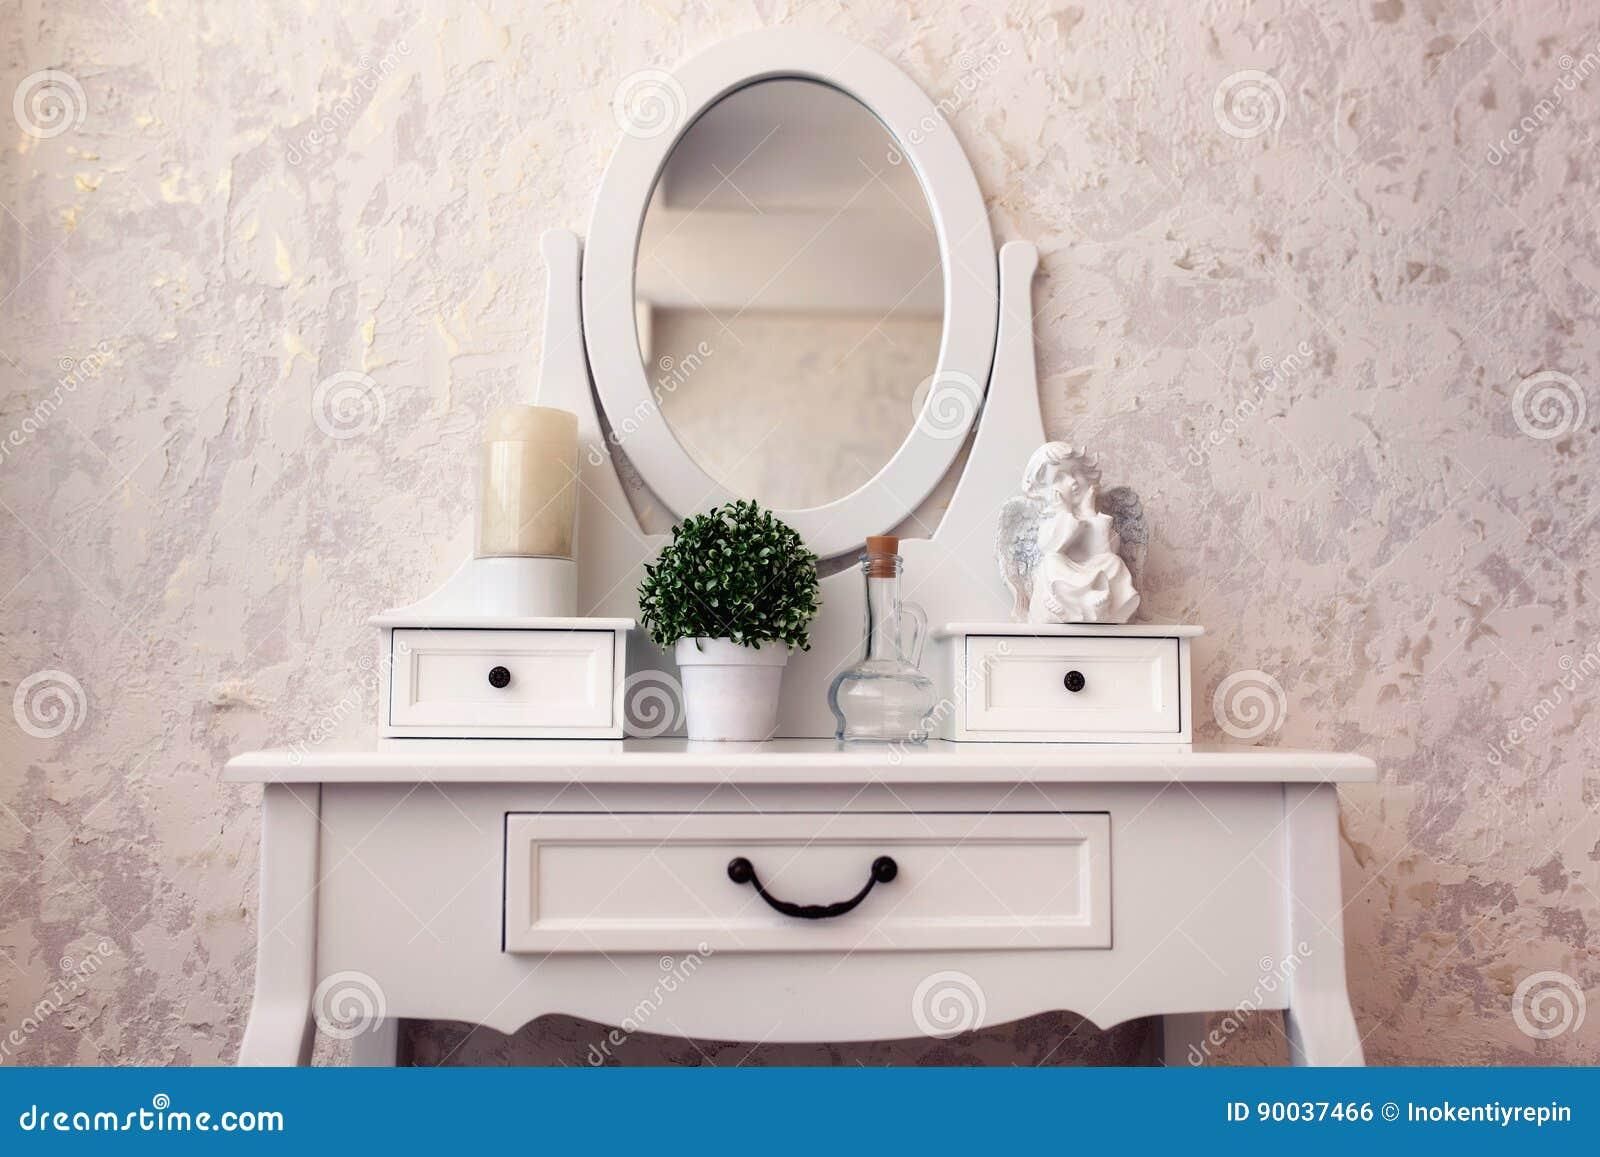 Toilettafel Met Spiegel Wit.Mooie Houten Toilettafel Met Spiegel Op Wit Behang Als Achtergrond